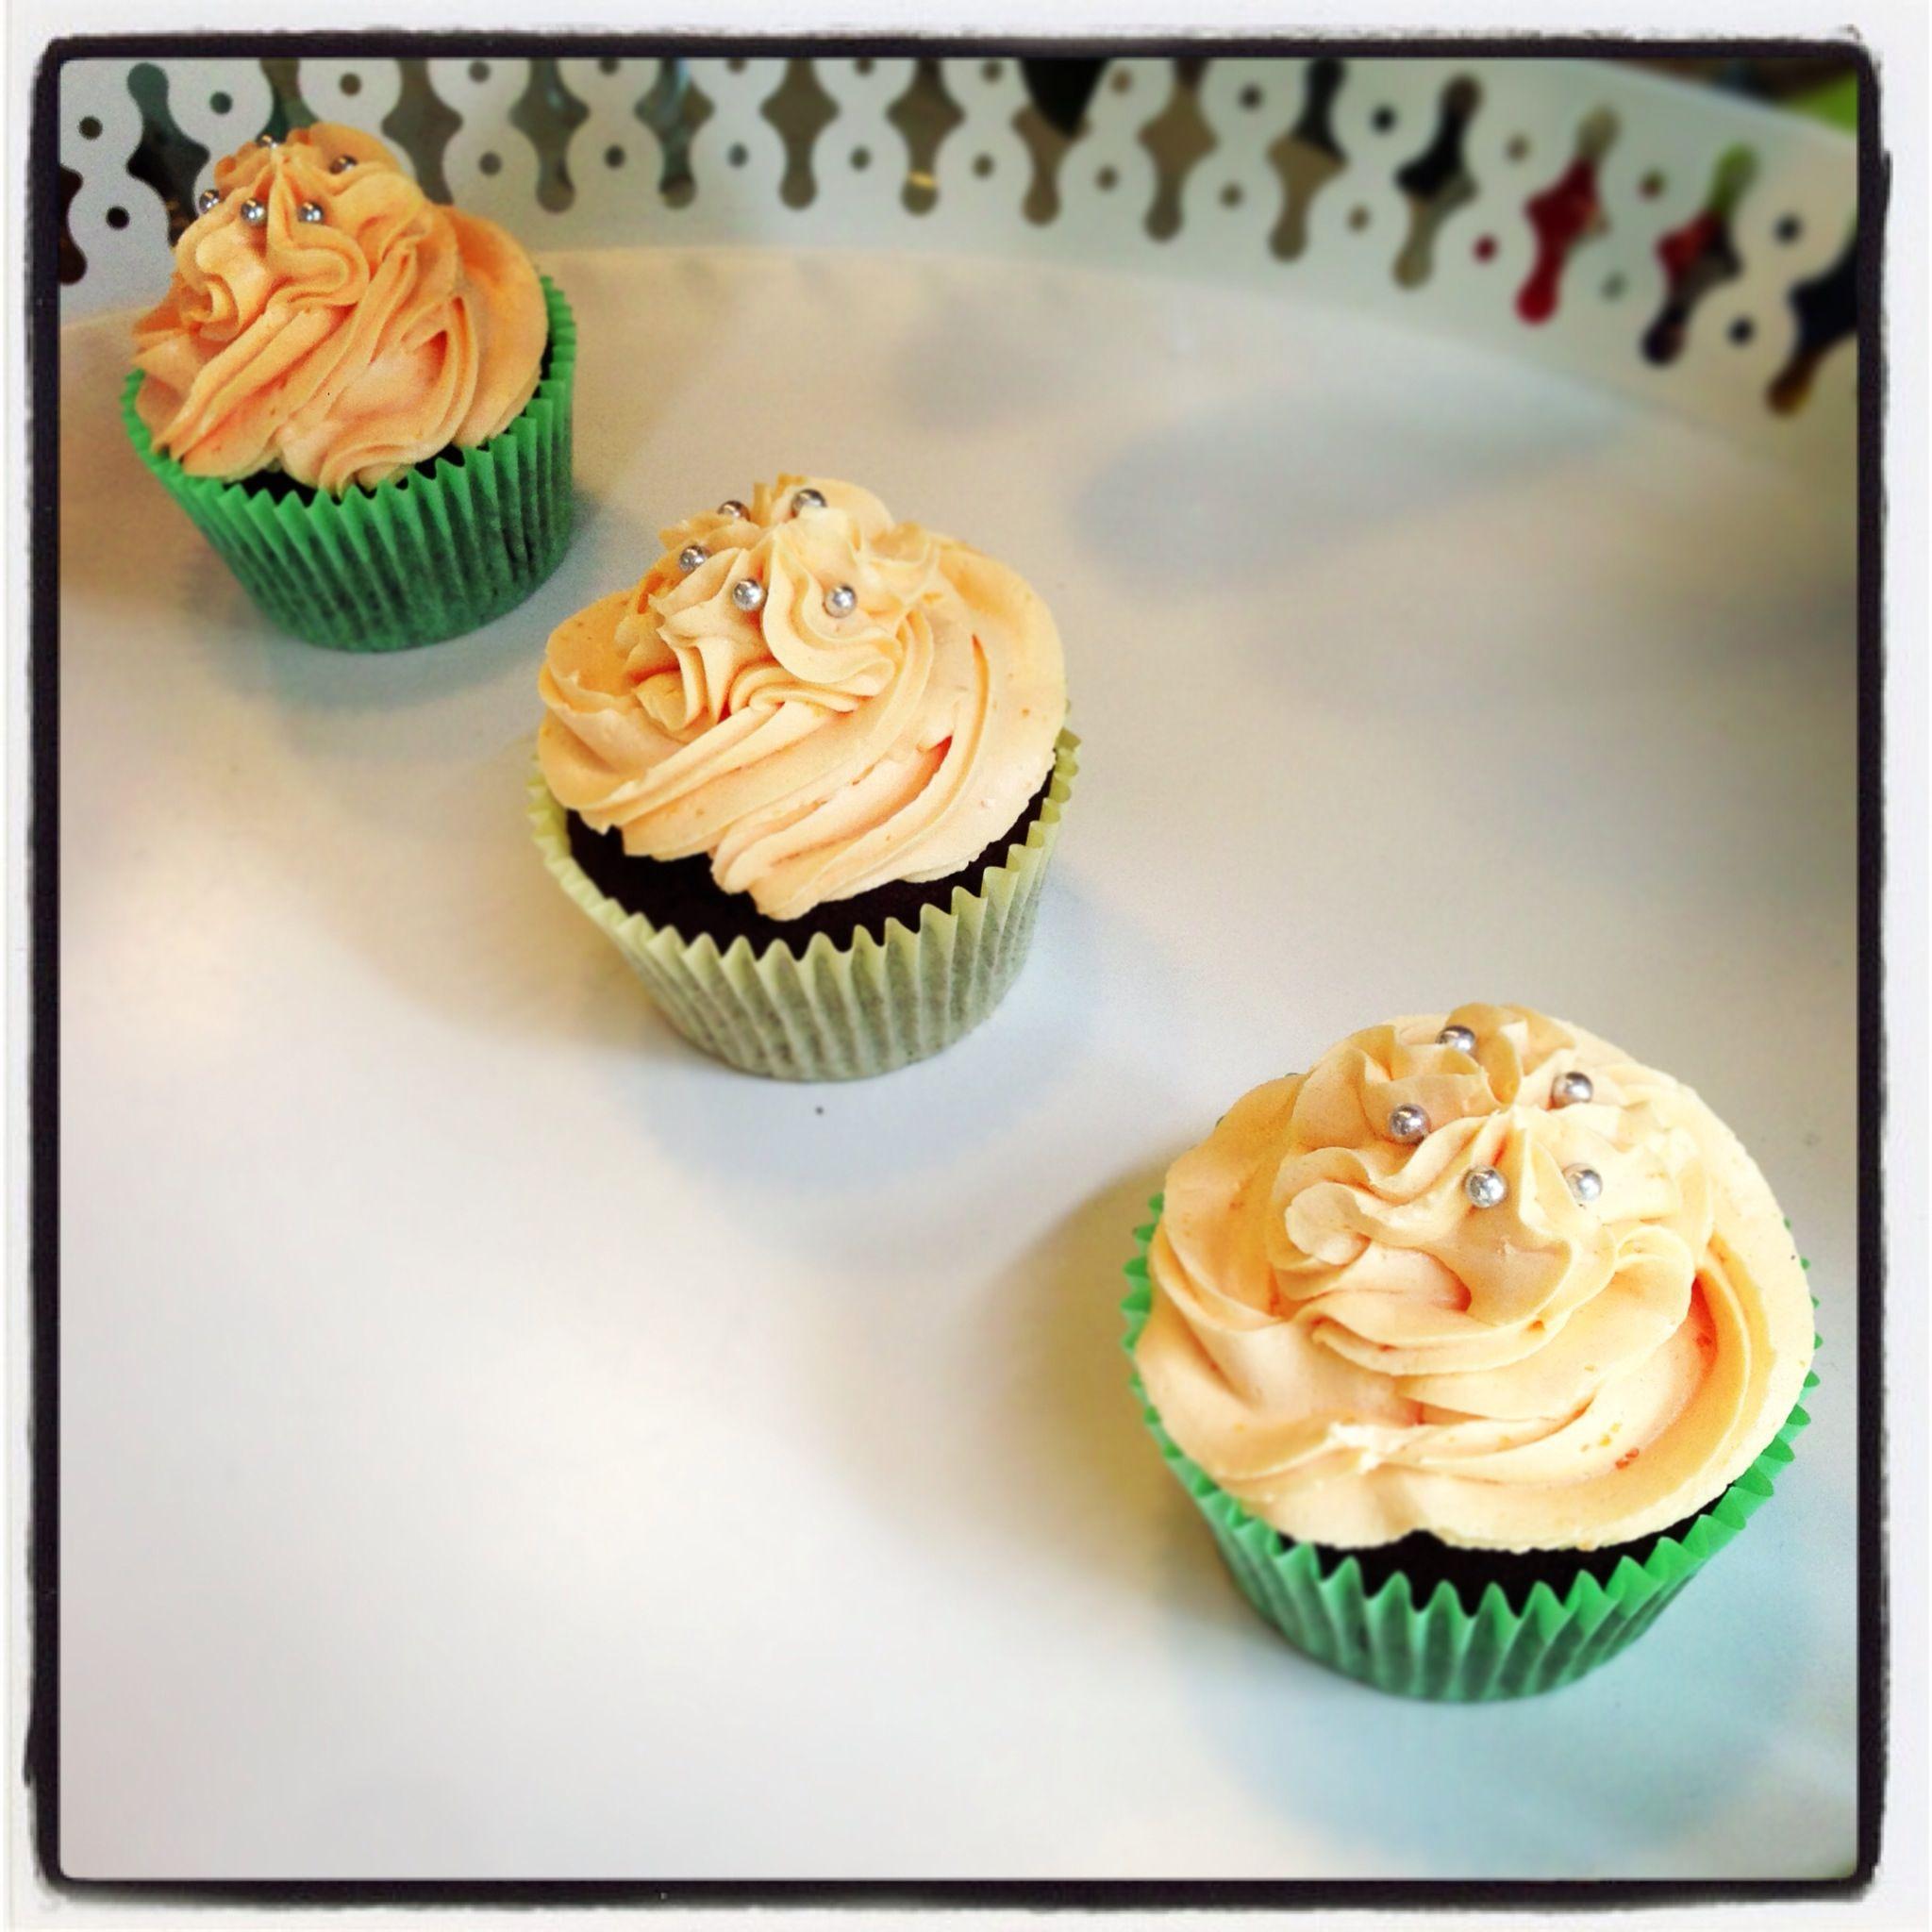 Chocolate Orange cupcakes | Vintage Bakery Shop | Pinterest